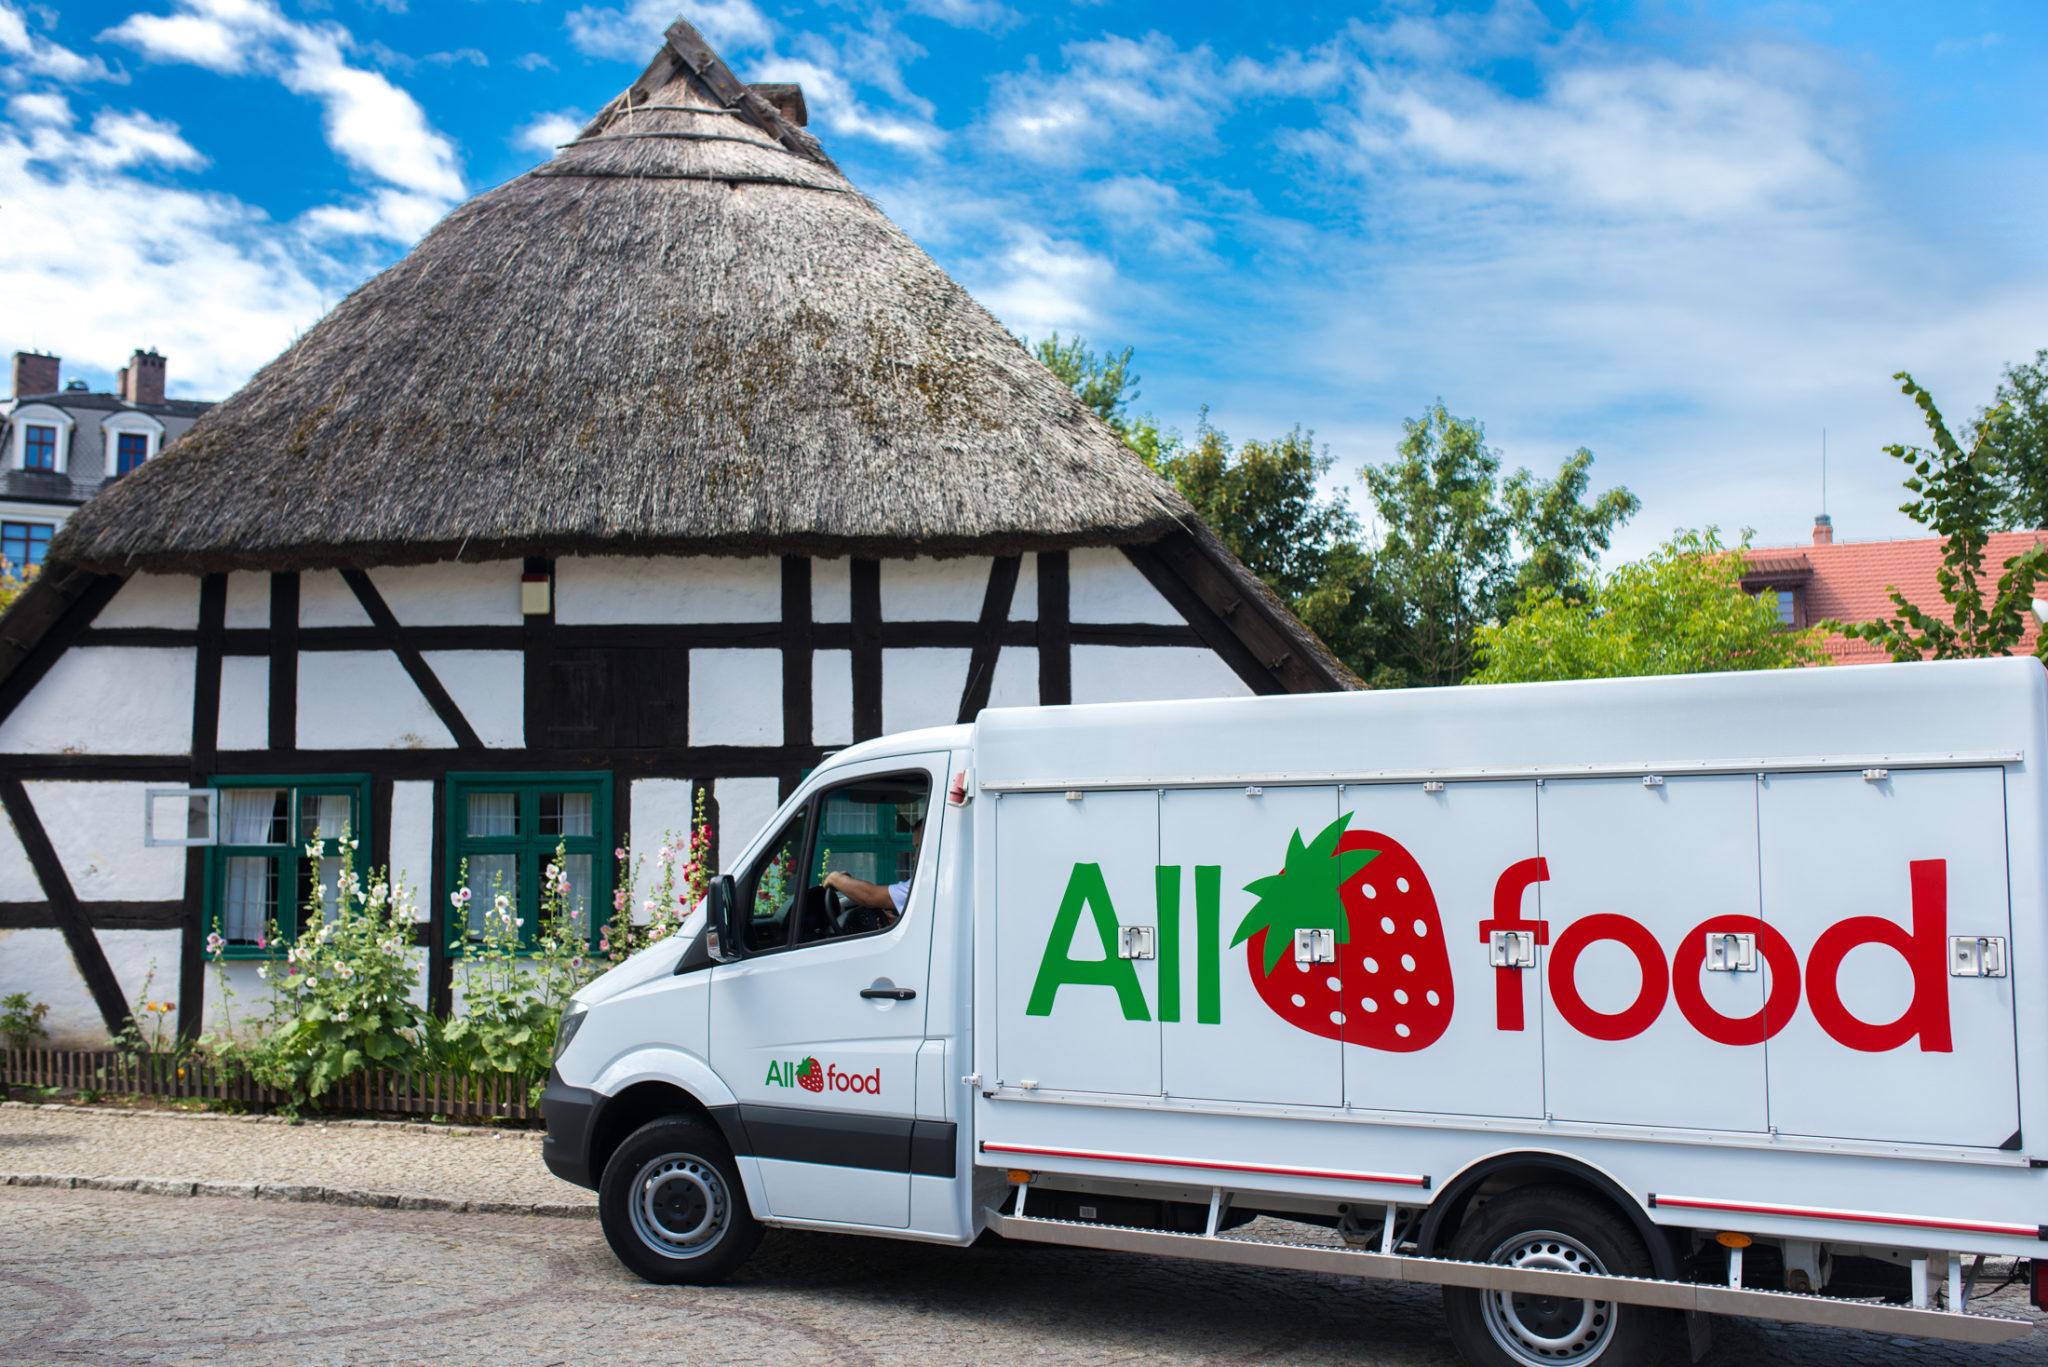 allfood-2350